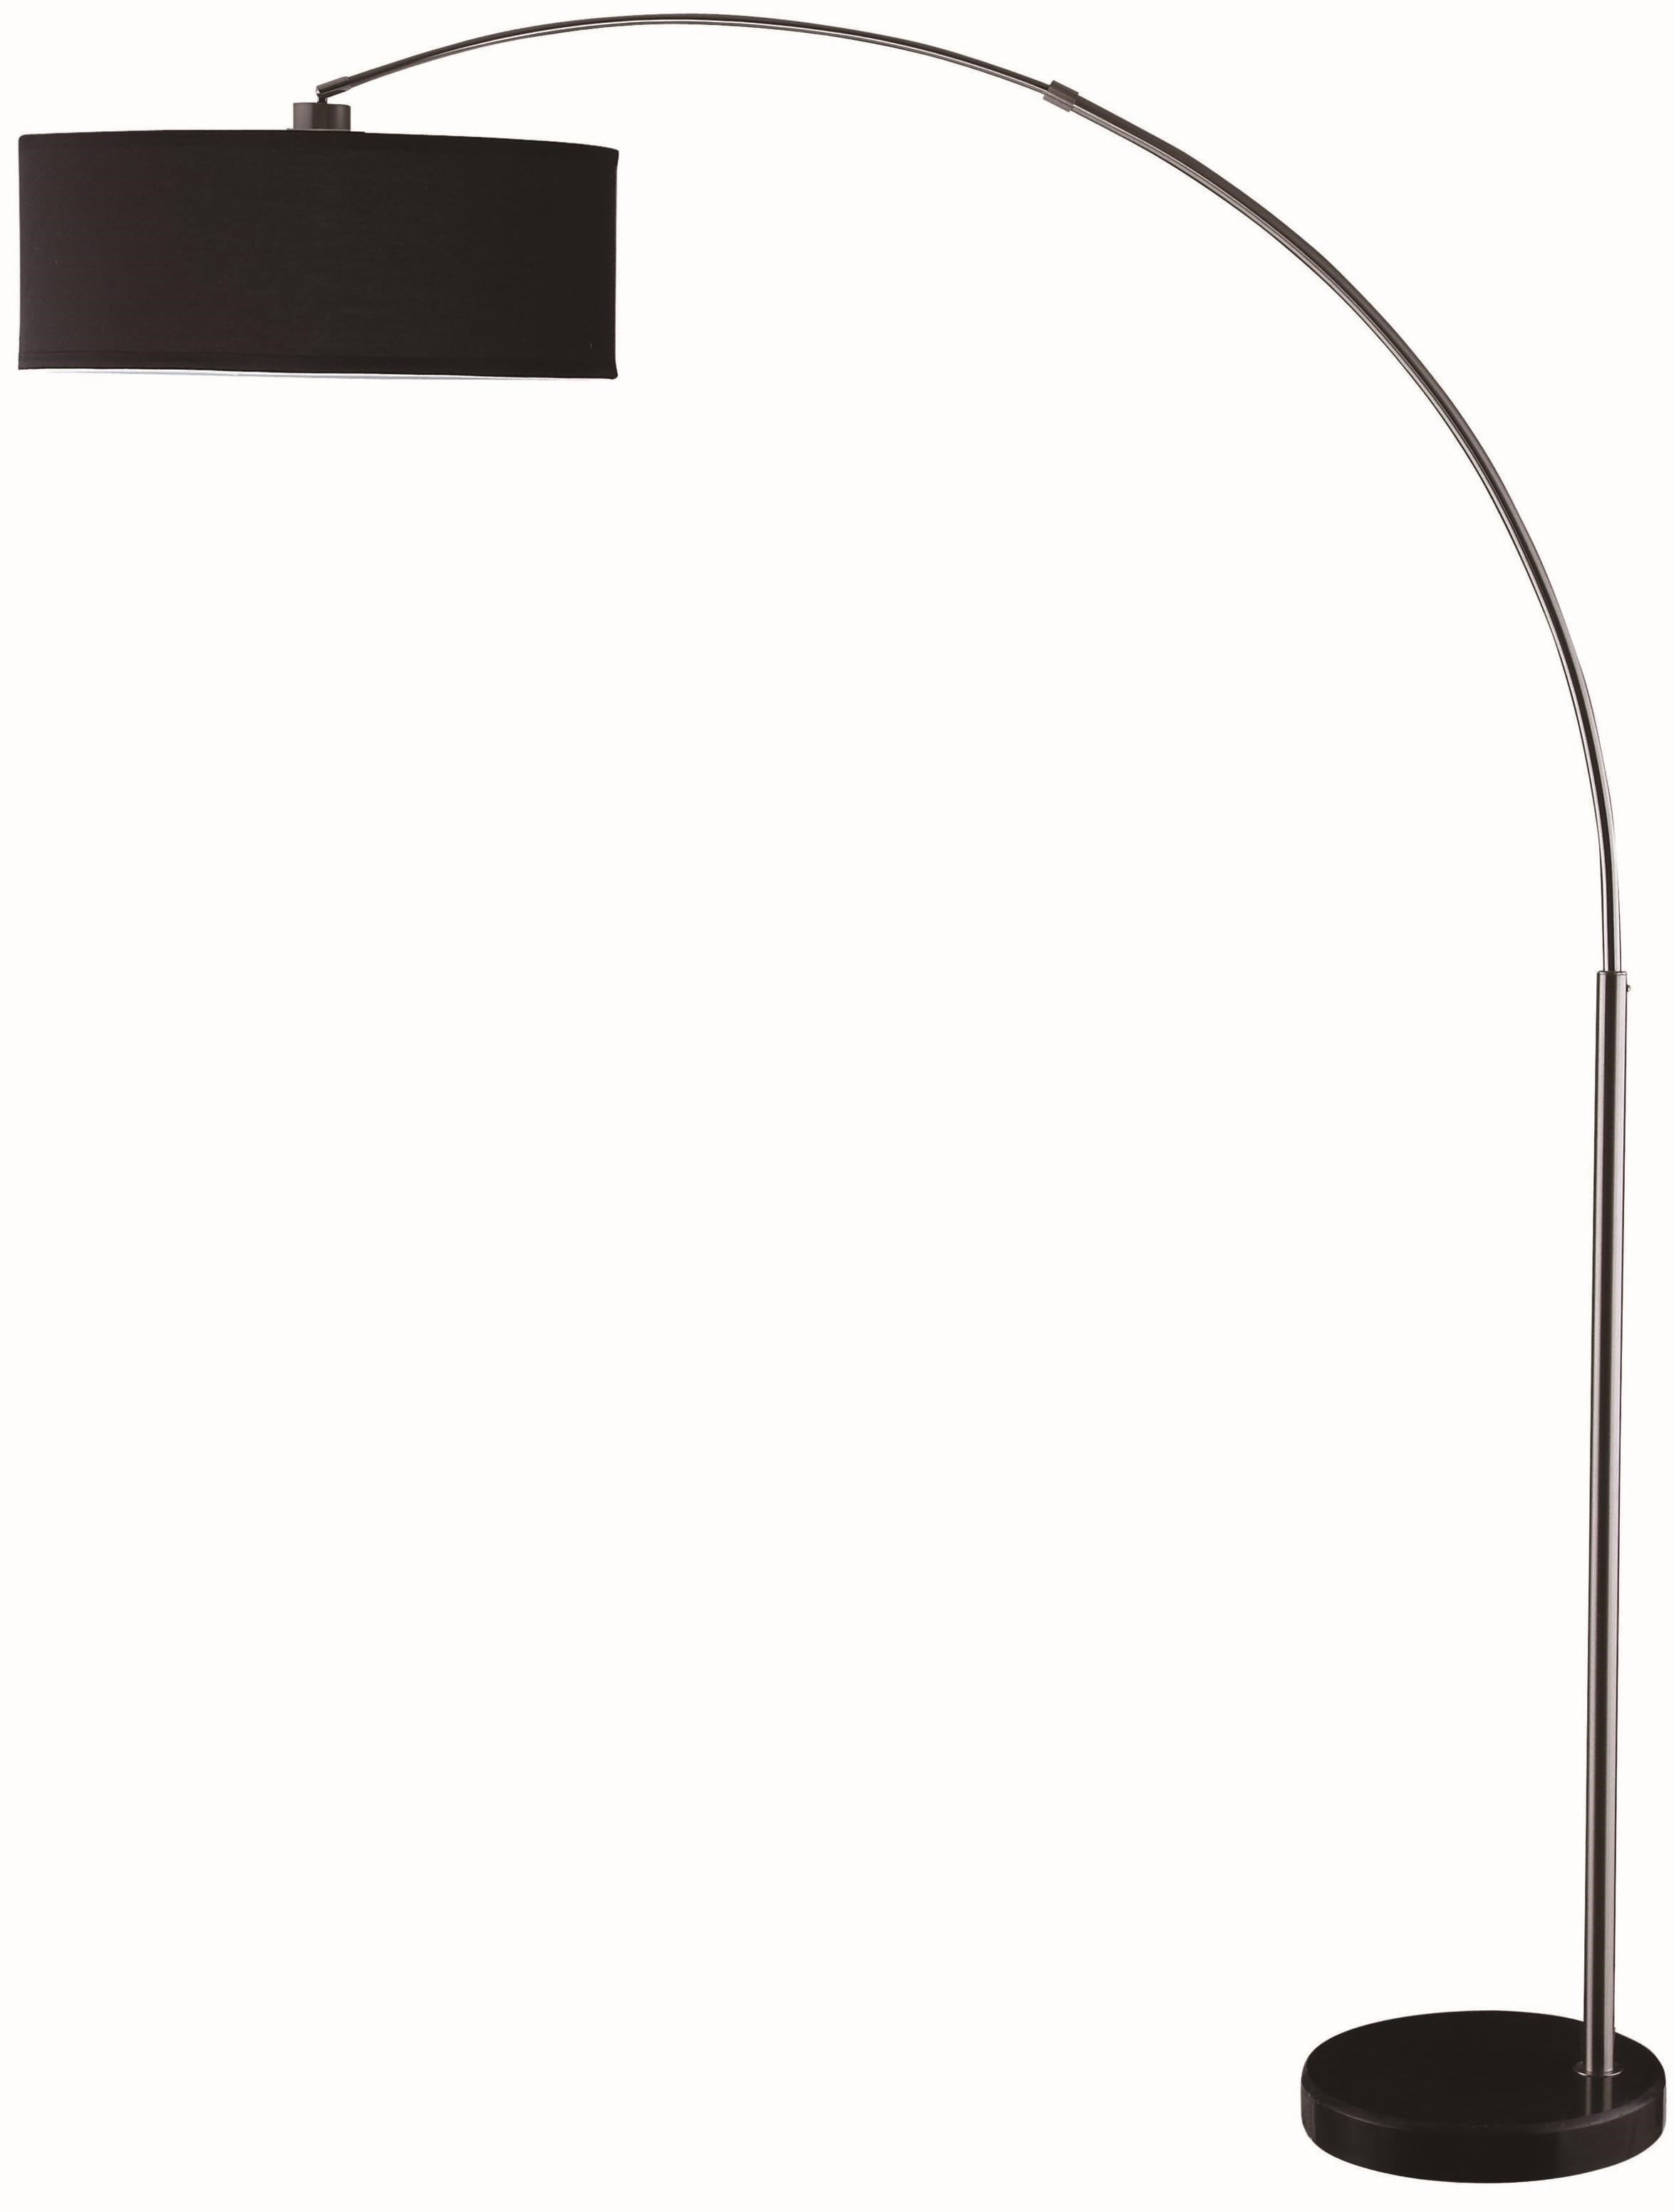 Coaster Floor Lamps 901486 Contemporary Hanging Floor Lamp